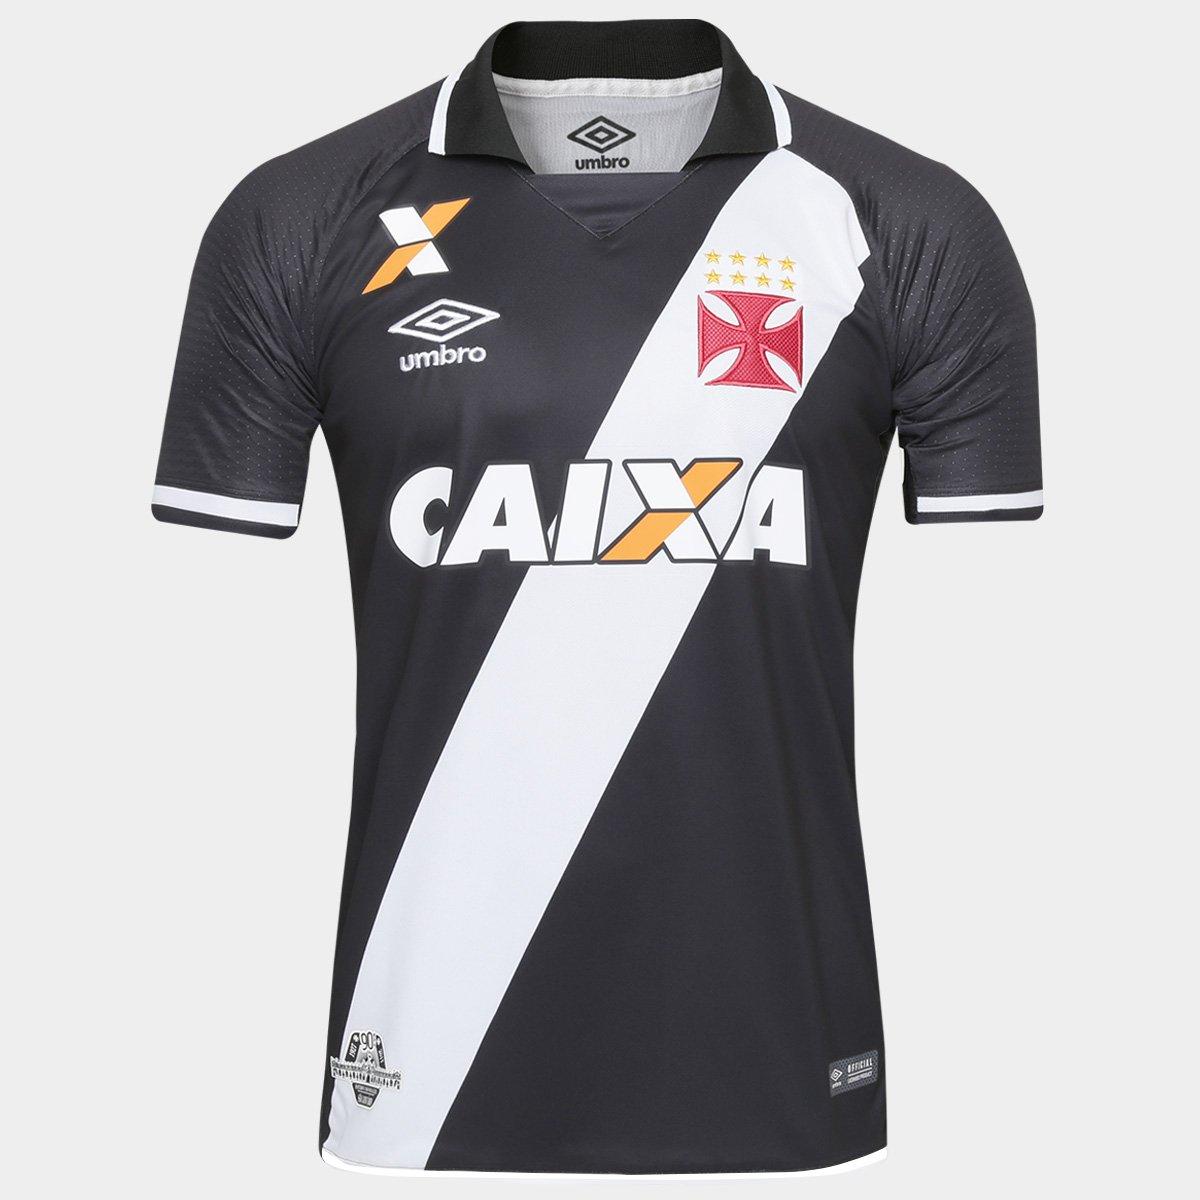 0b99dab7c0b06 Camisa Vasco I 17 18 s nº Torcedor Umbro Masculina - Compre Agora ...